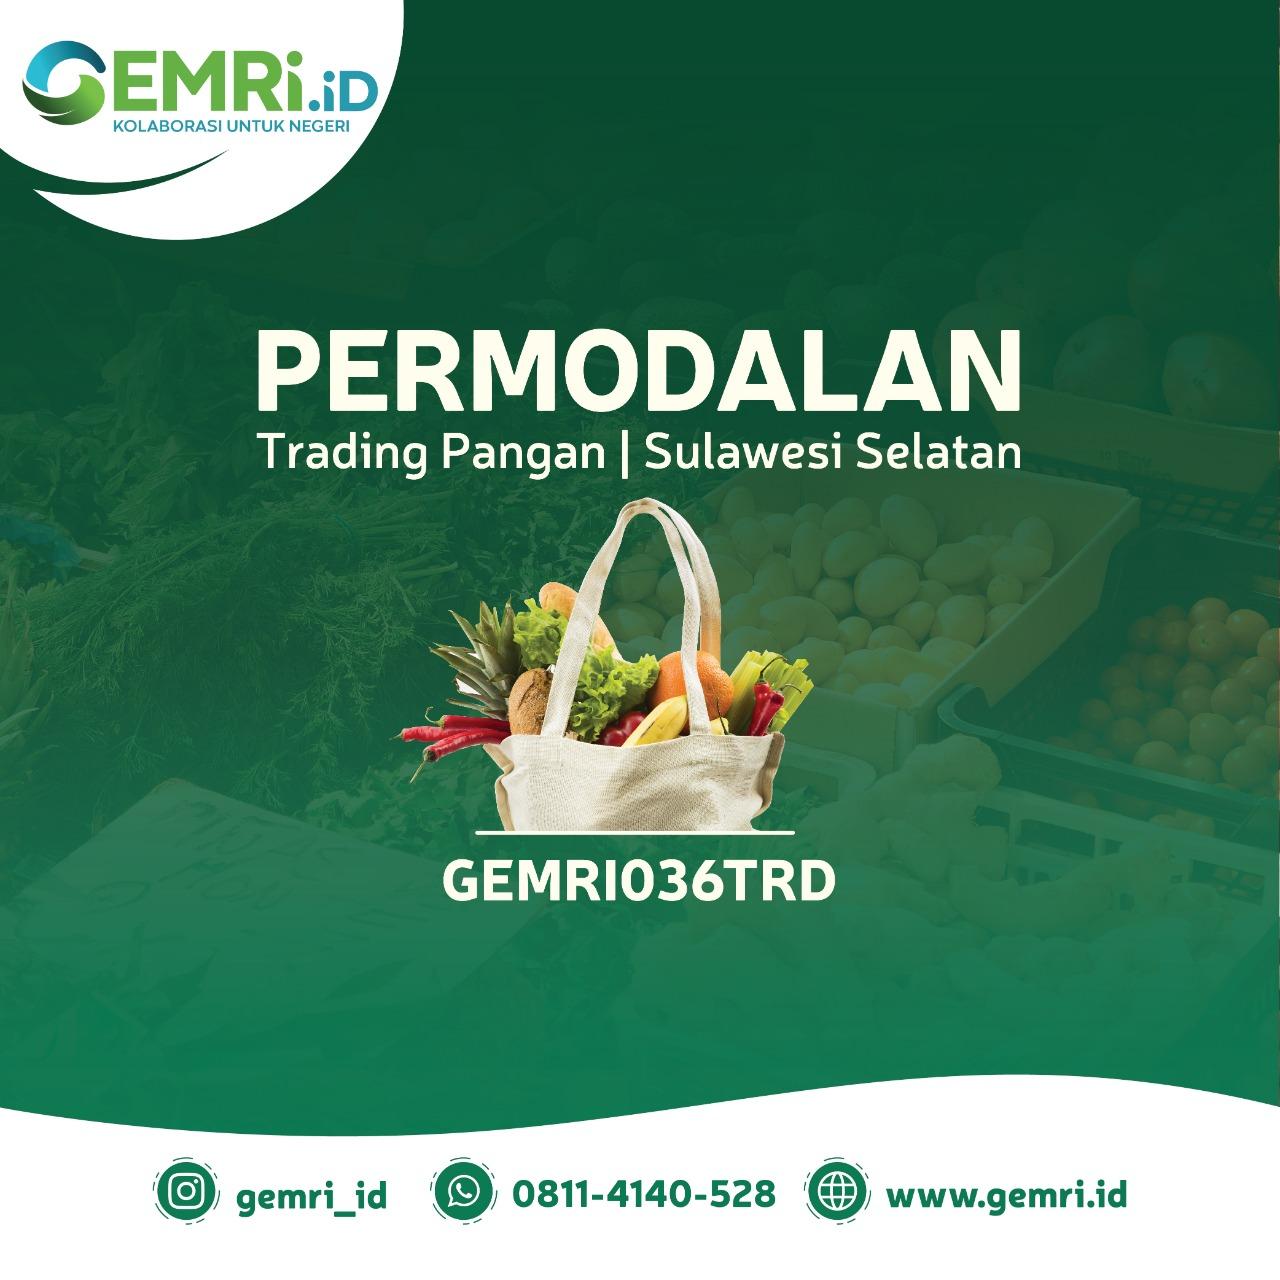 Permodalan Trading Pangan Sulawesi Selatan